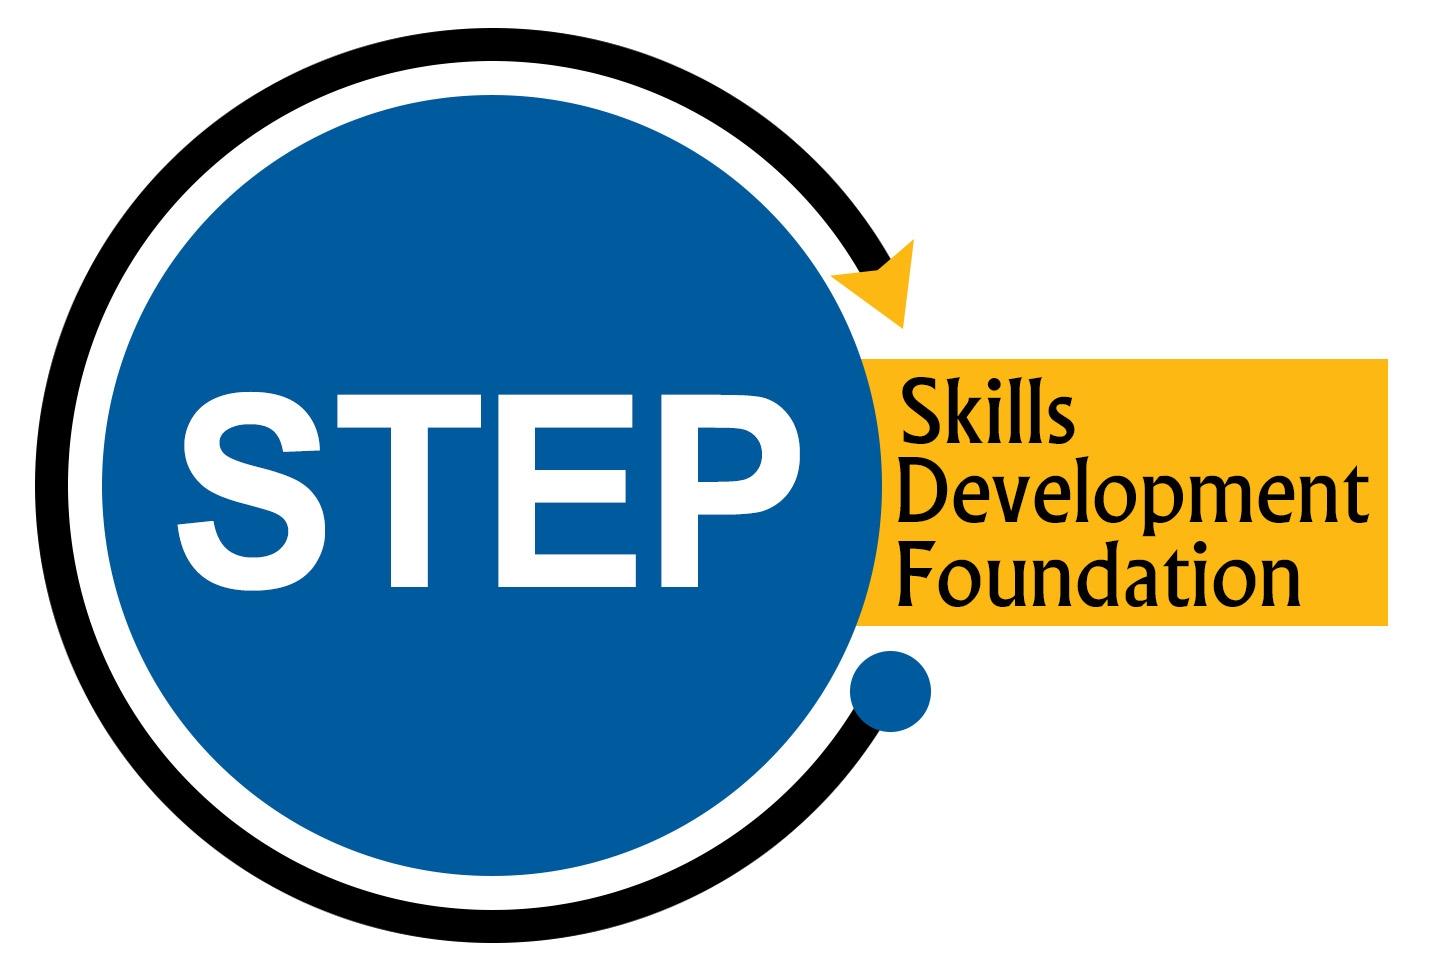 SSDF STEP Skills Development Foundation  (@ssdforgpk) Cover Image